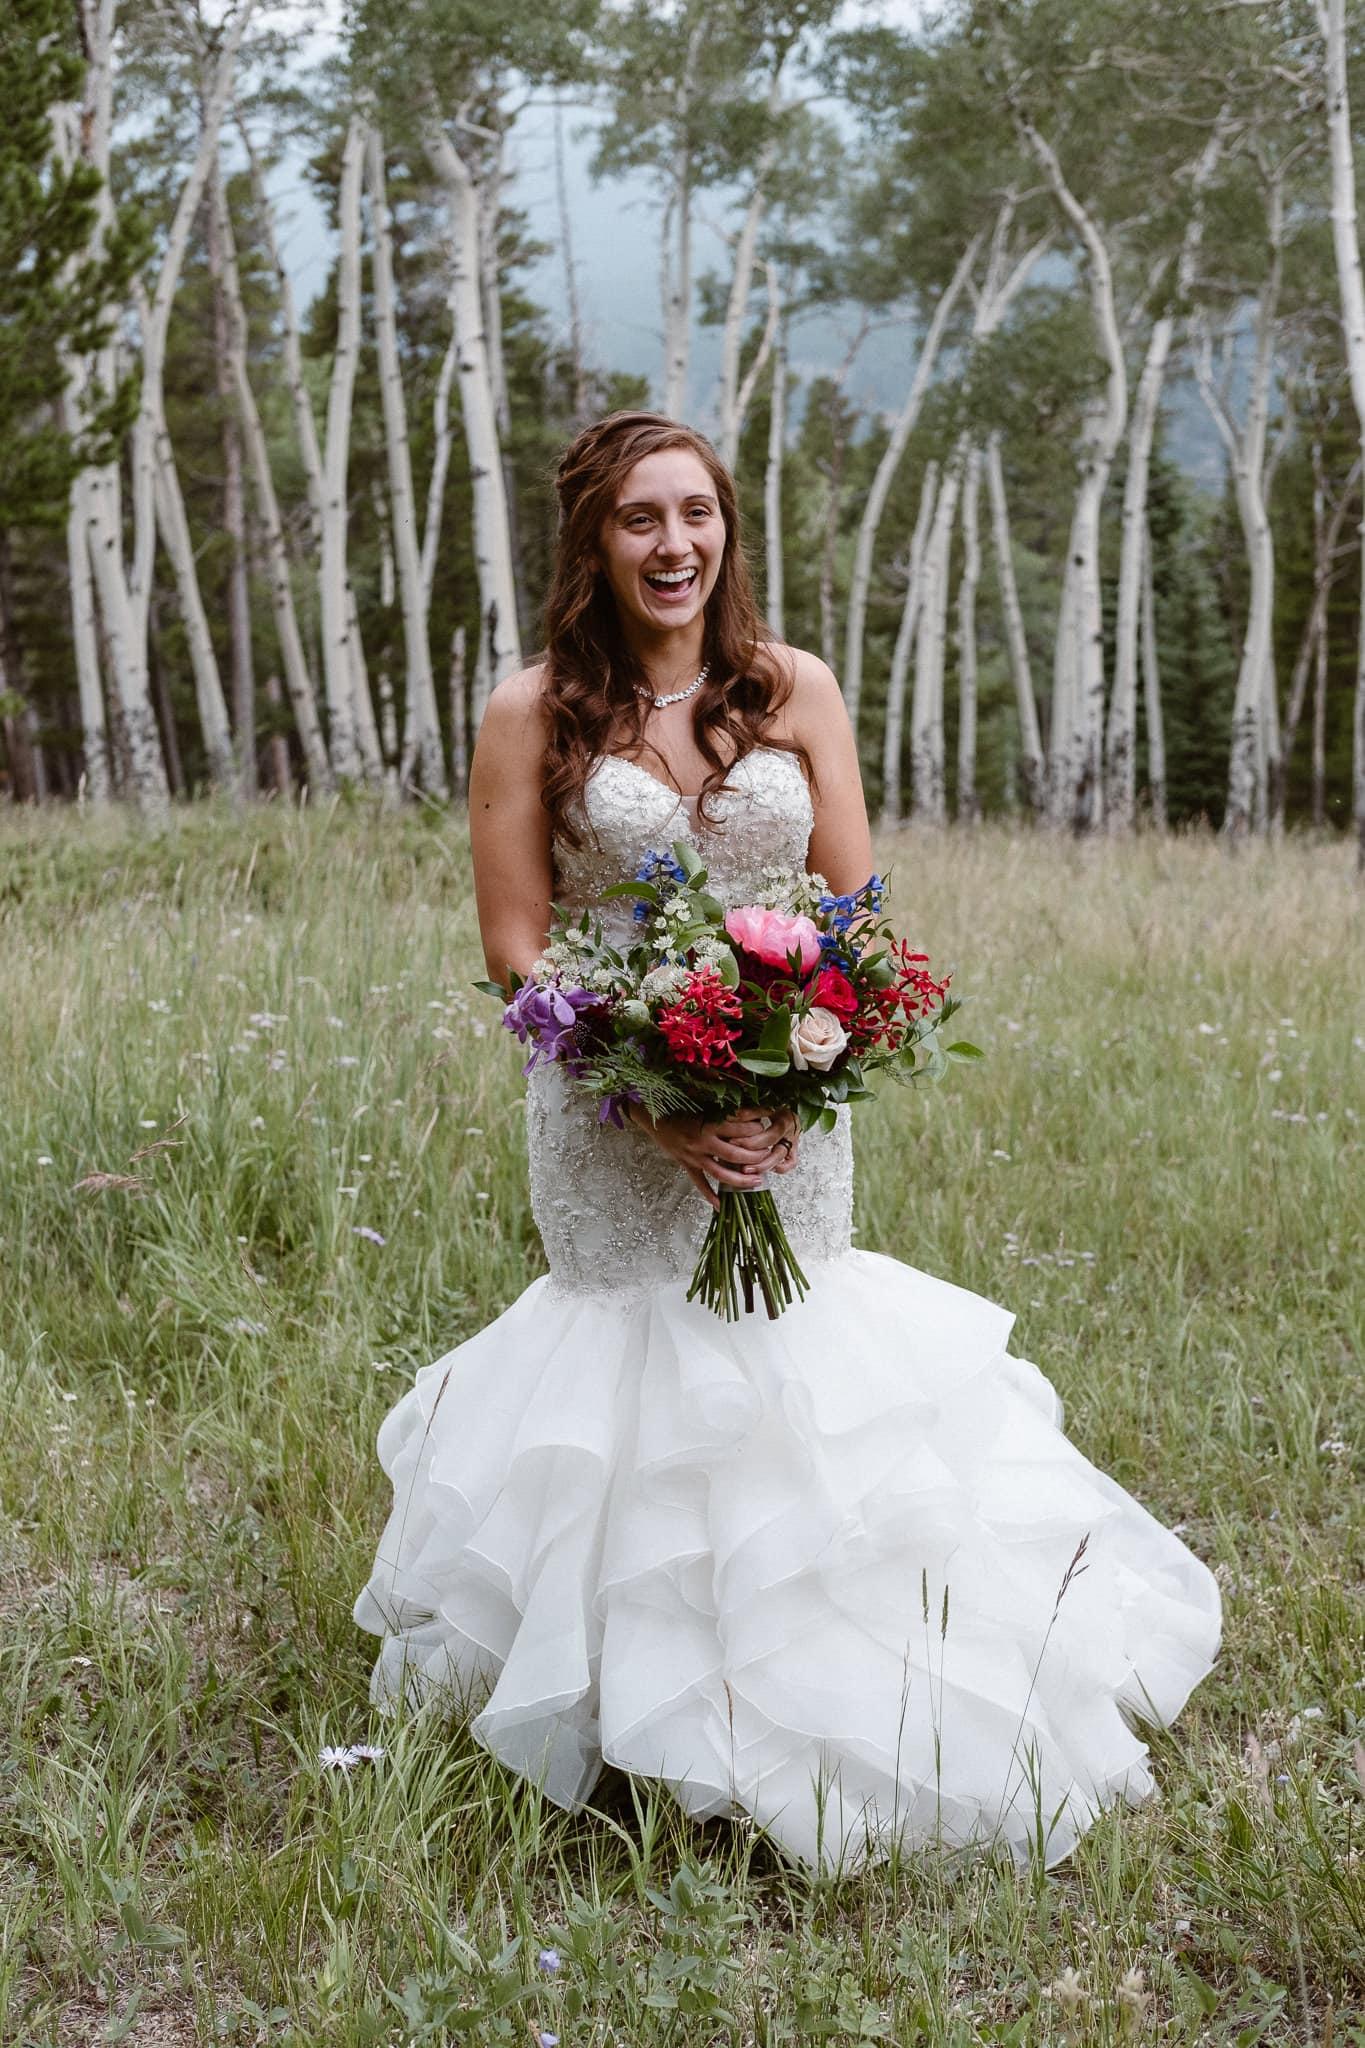 Dao House wedding photographer, Estes Park wedding venue, Colorado mountain wedding, outdoor ceremony, mountain ceremony, bride and groom portrait, aspen grove wedding,